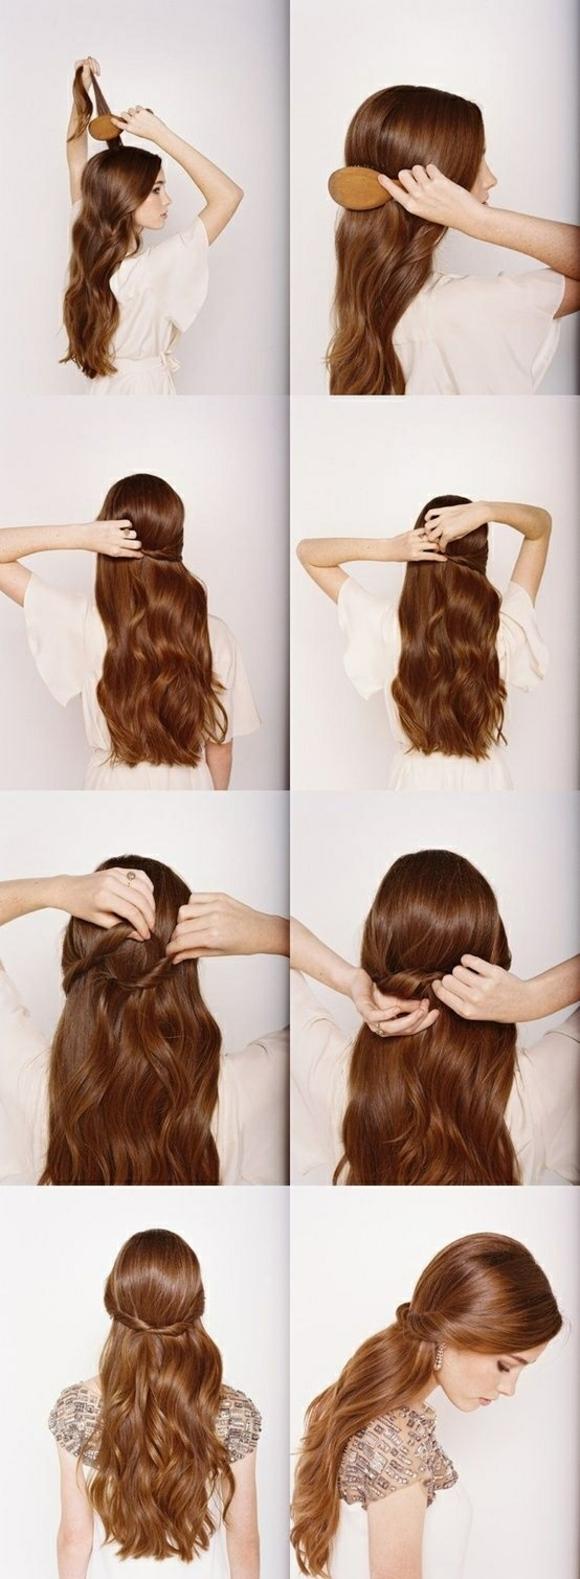 idee-coiffure-cheveux-longs-romantique